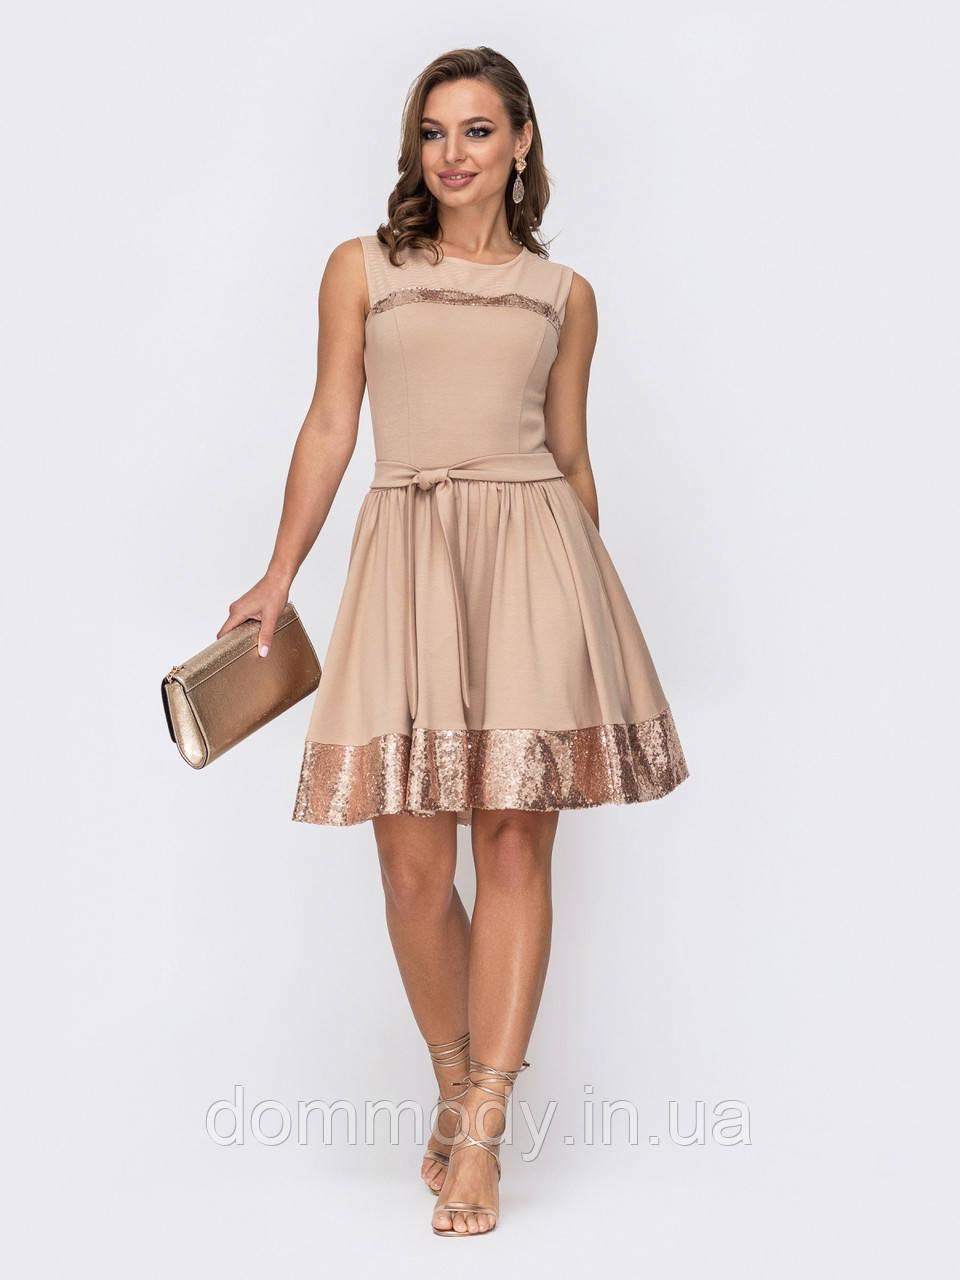 Платье женское Alice beige